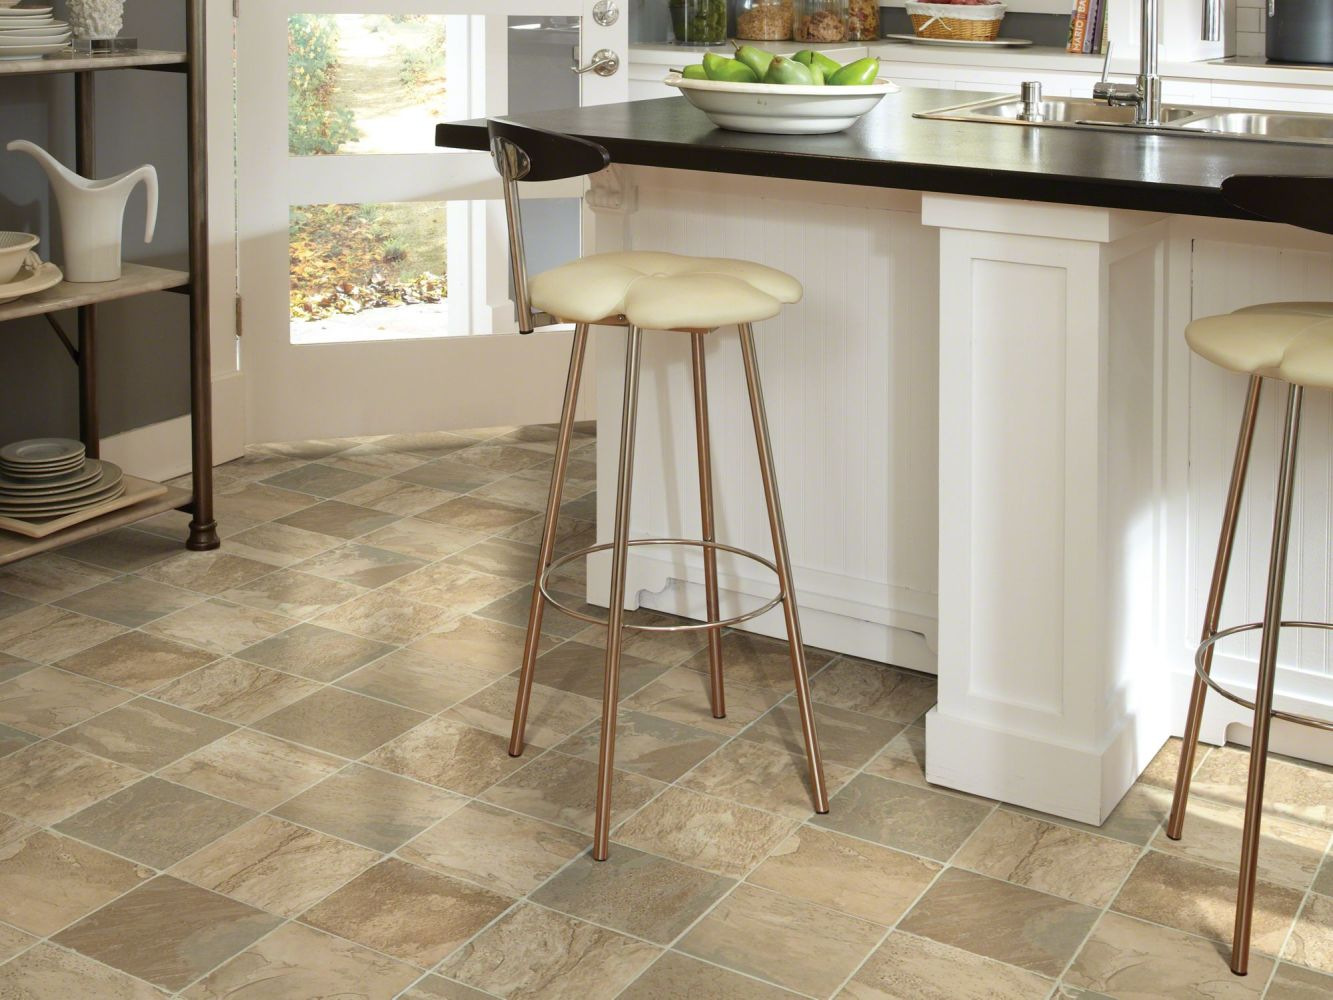 Shaw Floors Vinyl Residential Plateau Cornerstone 00117_SA605